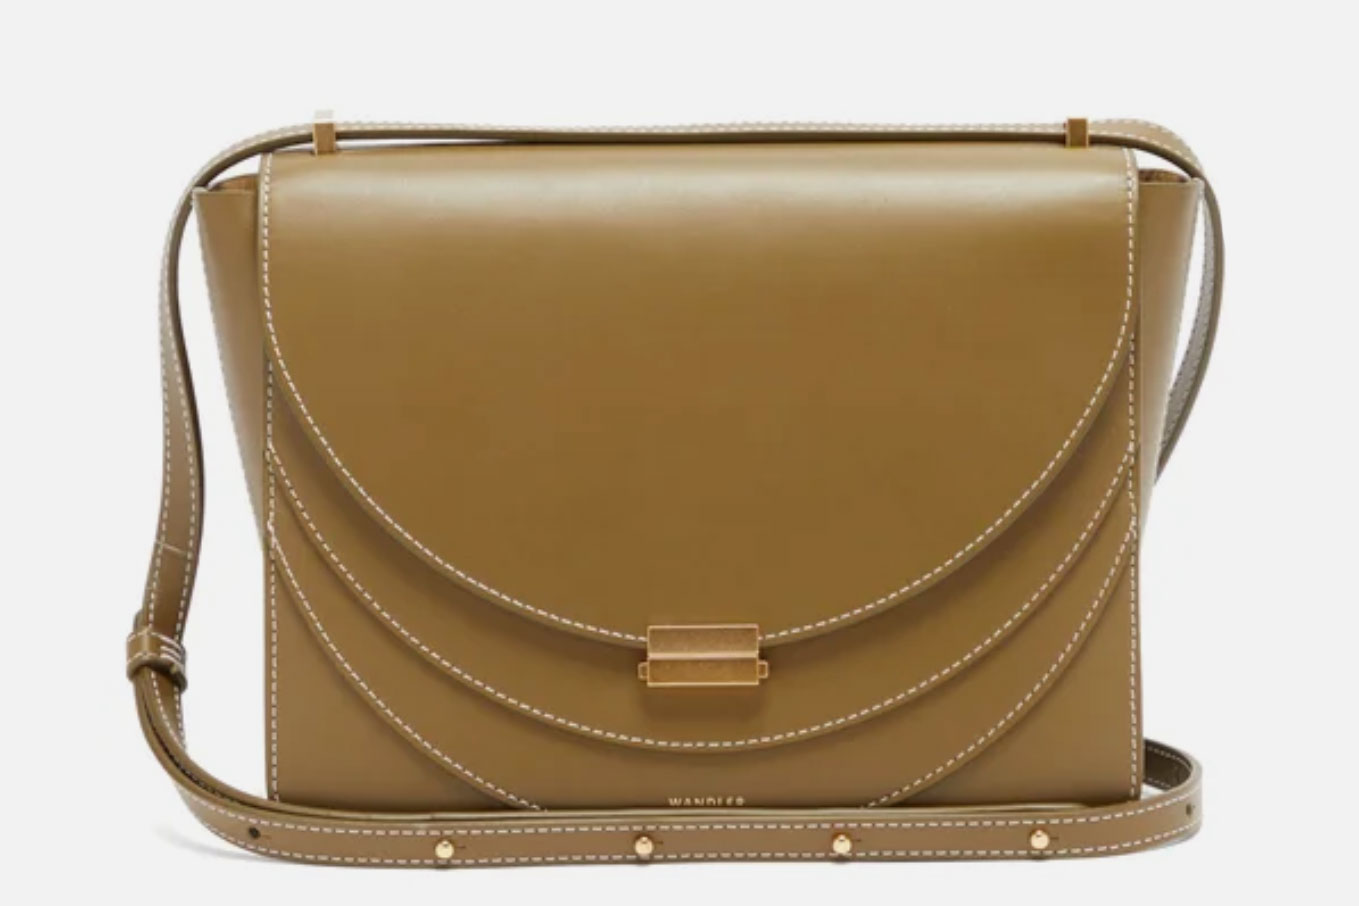 Wandler Luna Leather Crossbody Bag